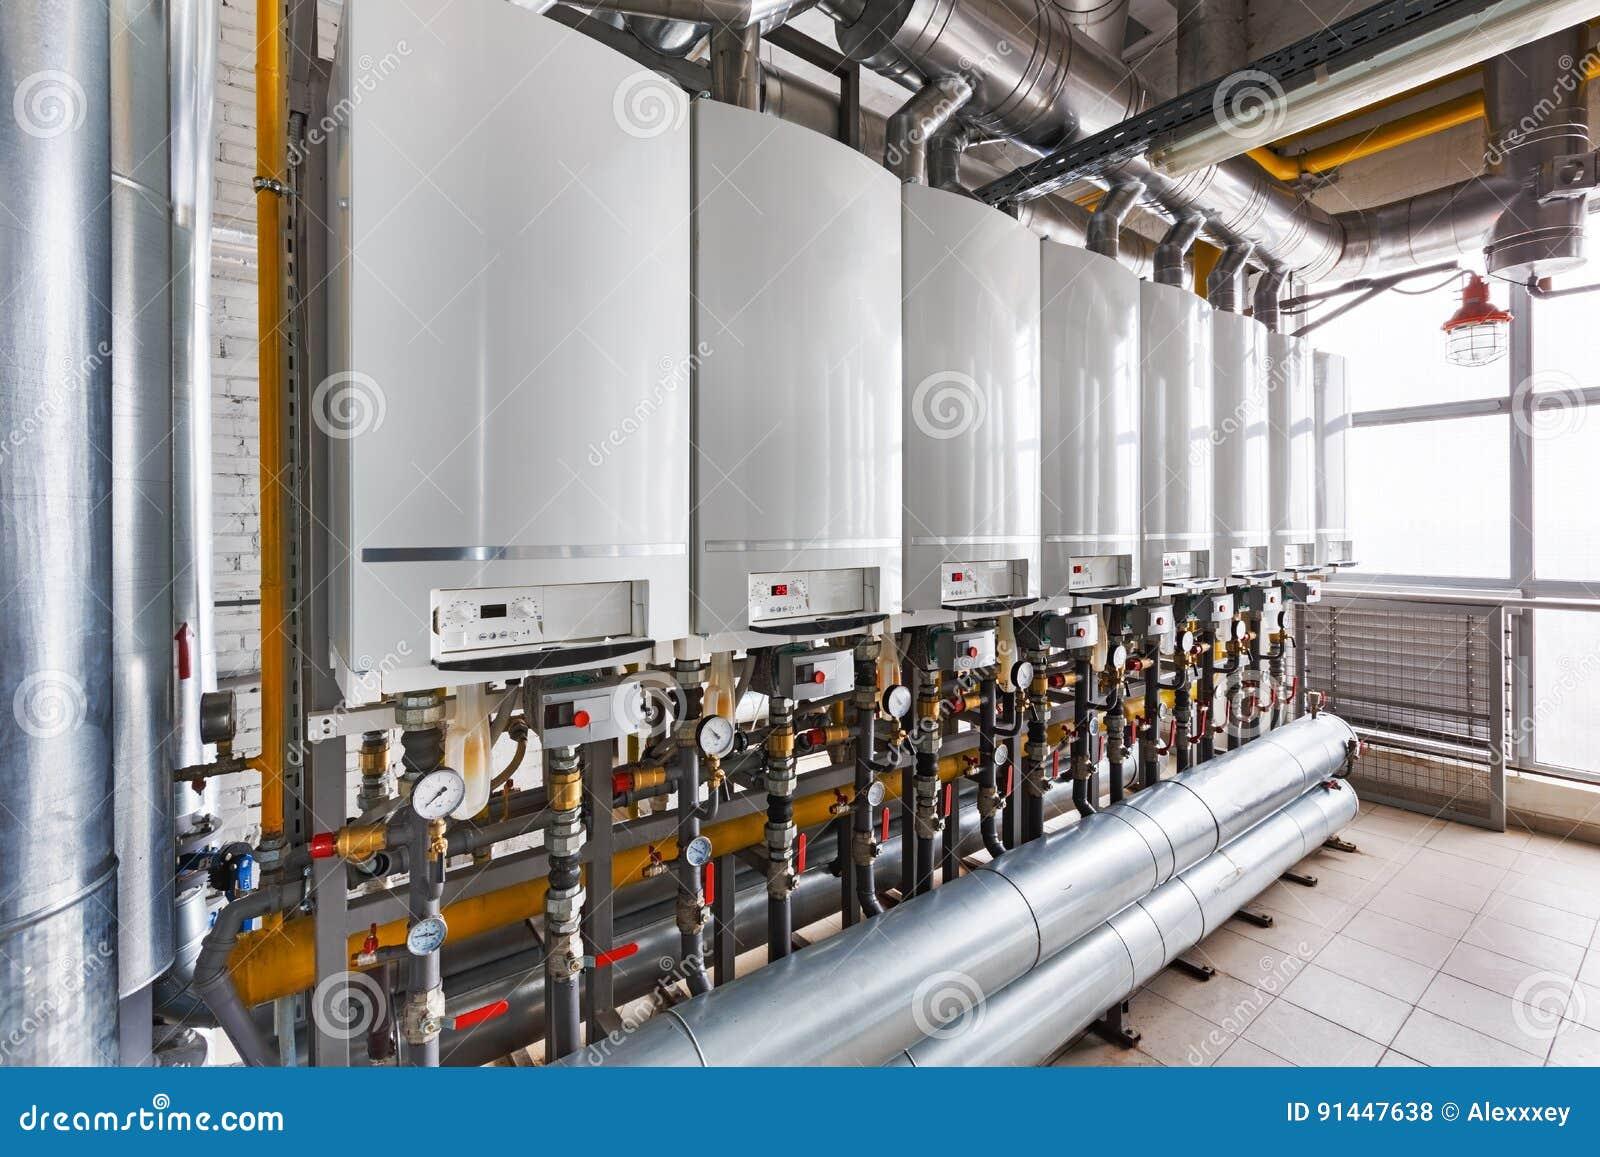 Binnenland van industrieel, gasketelhuis met heel wat boilers a